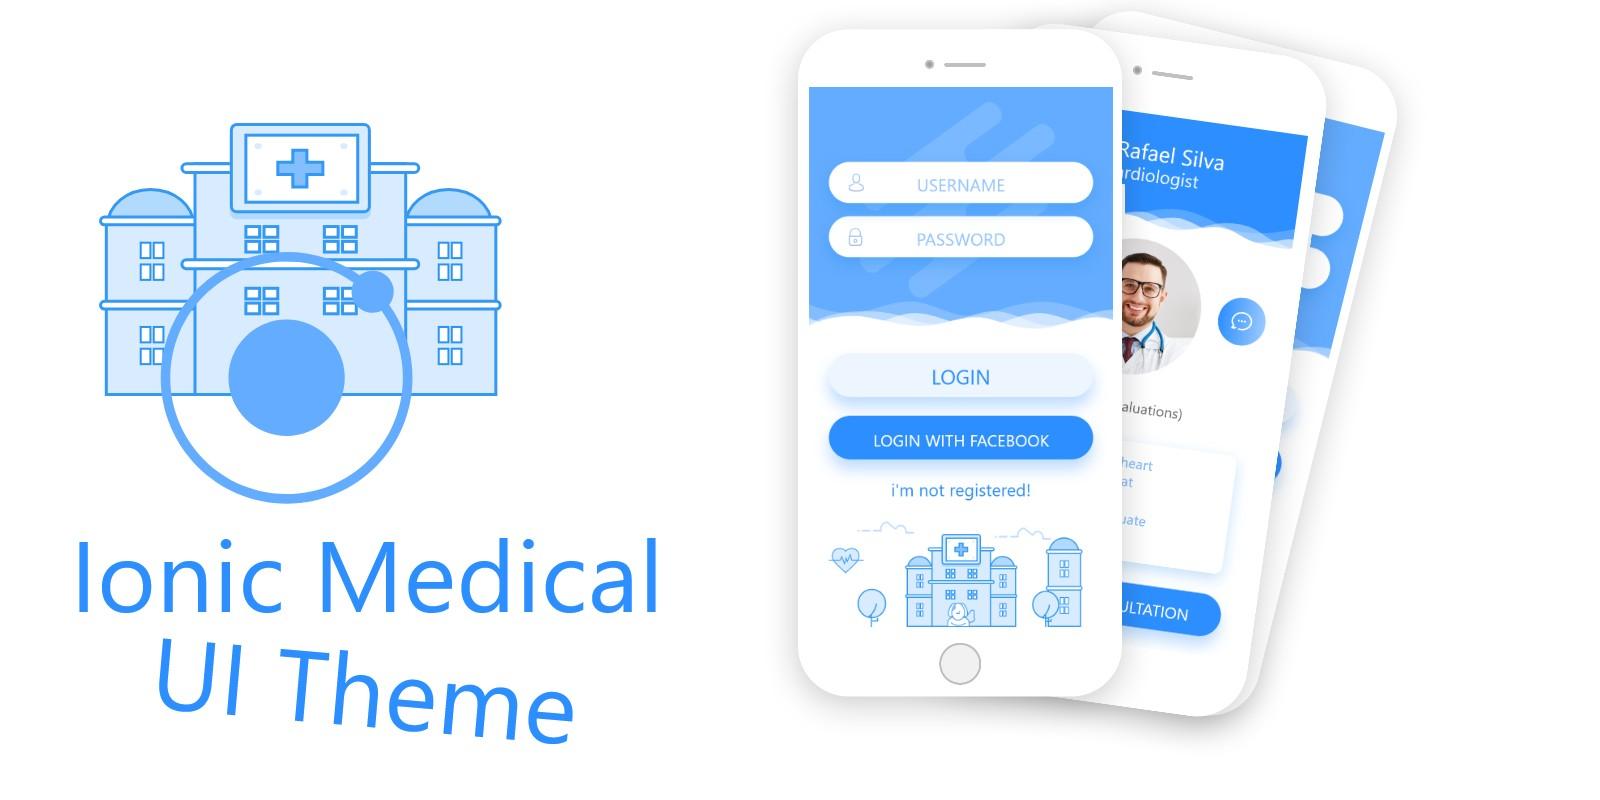 Ionic Medical UI Theme